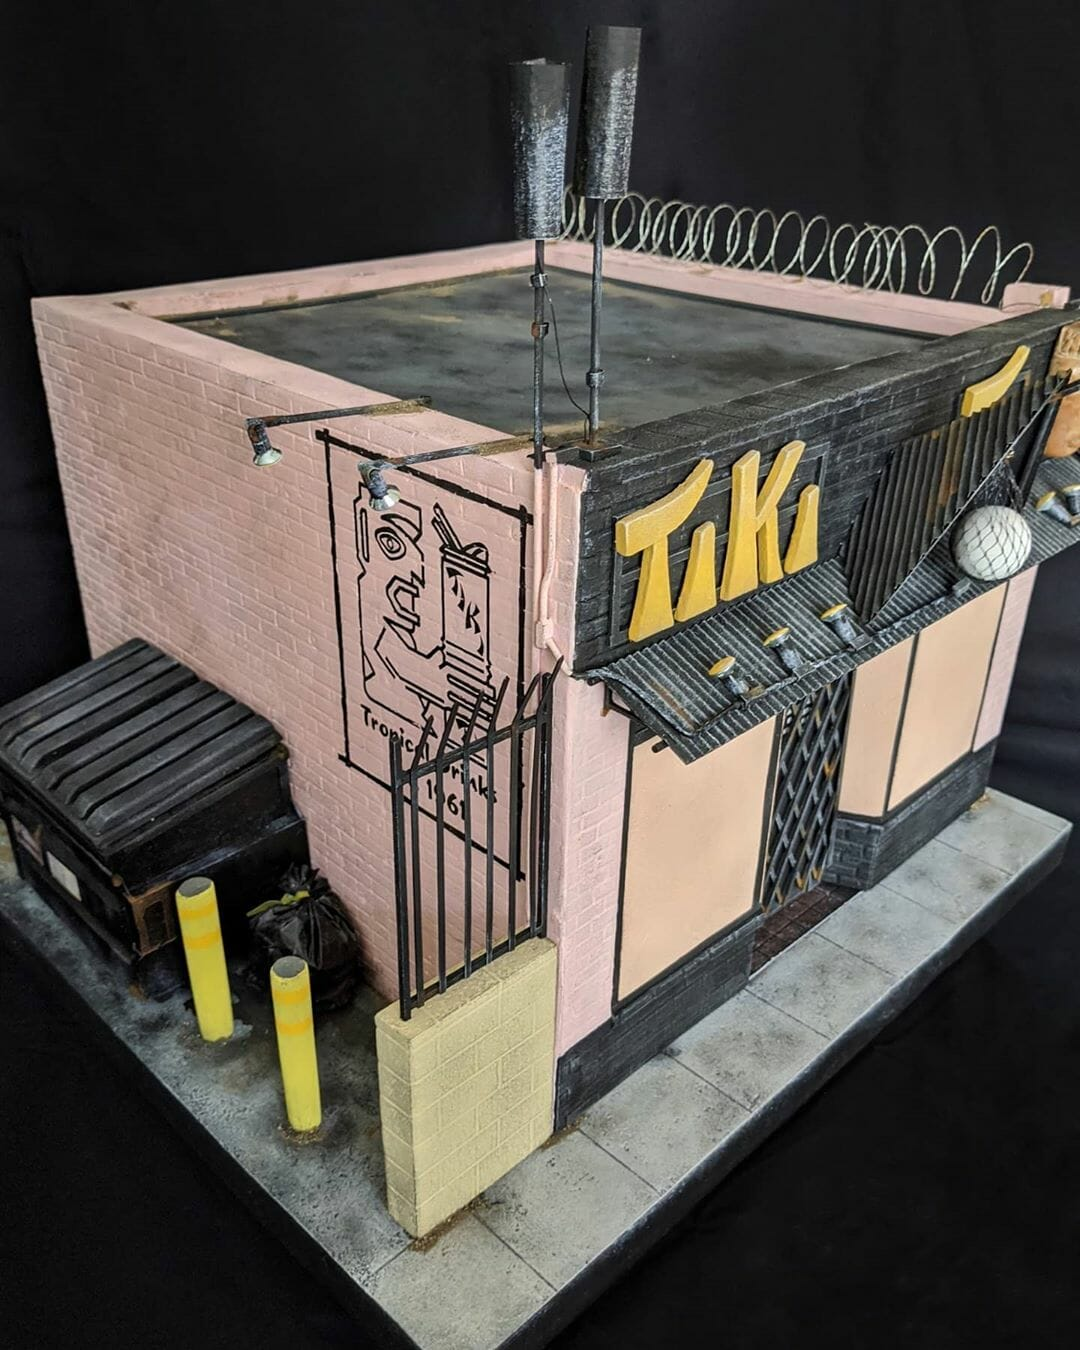 Reproduction miniature de Tiki Ti par l'artiste Kieran Wright